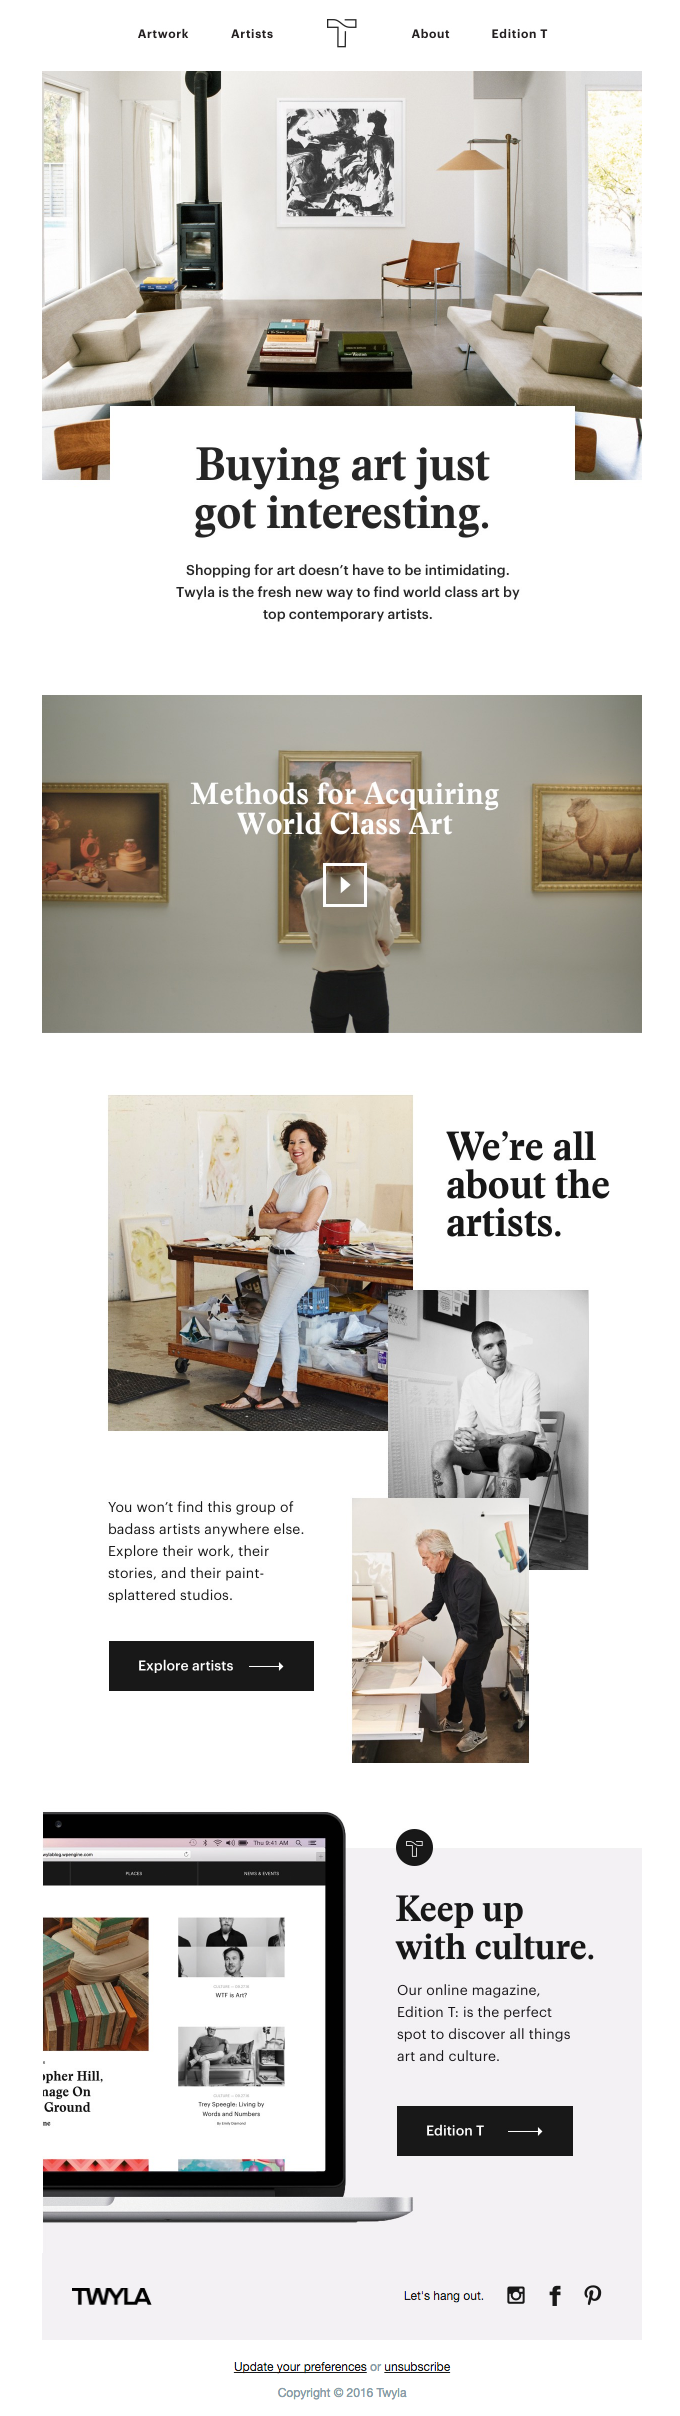 Meet Twyla, a new way to buy art.